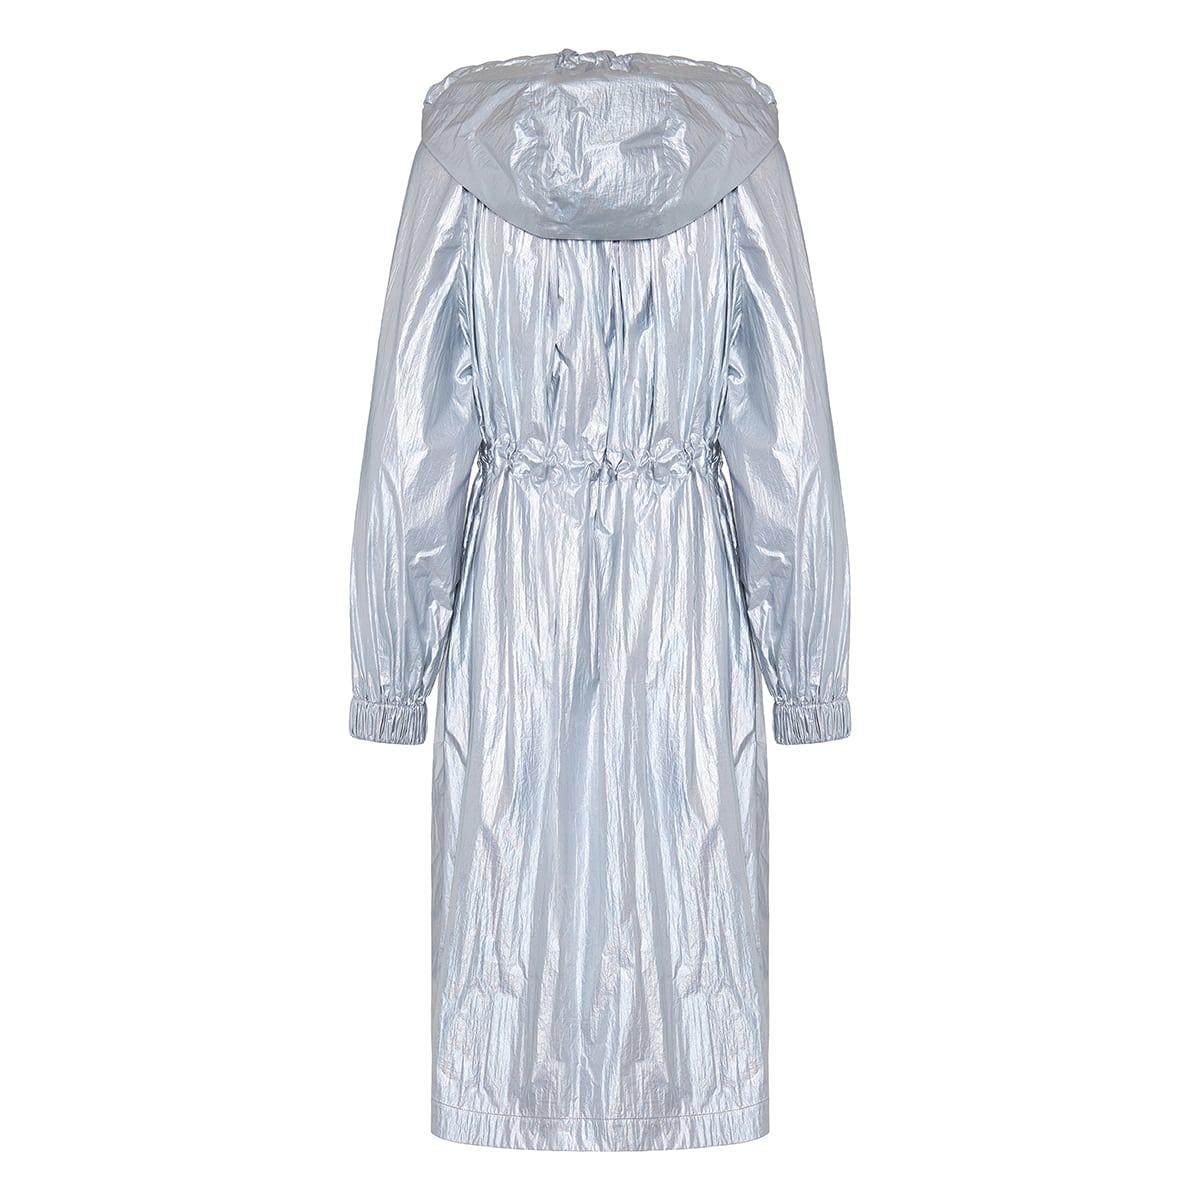 Akubens metallic parka coat